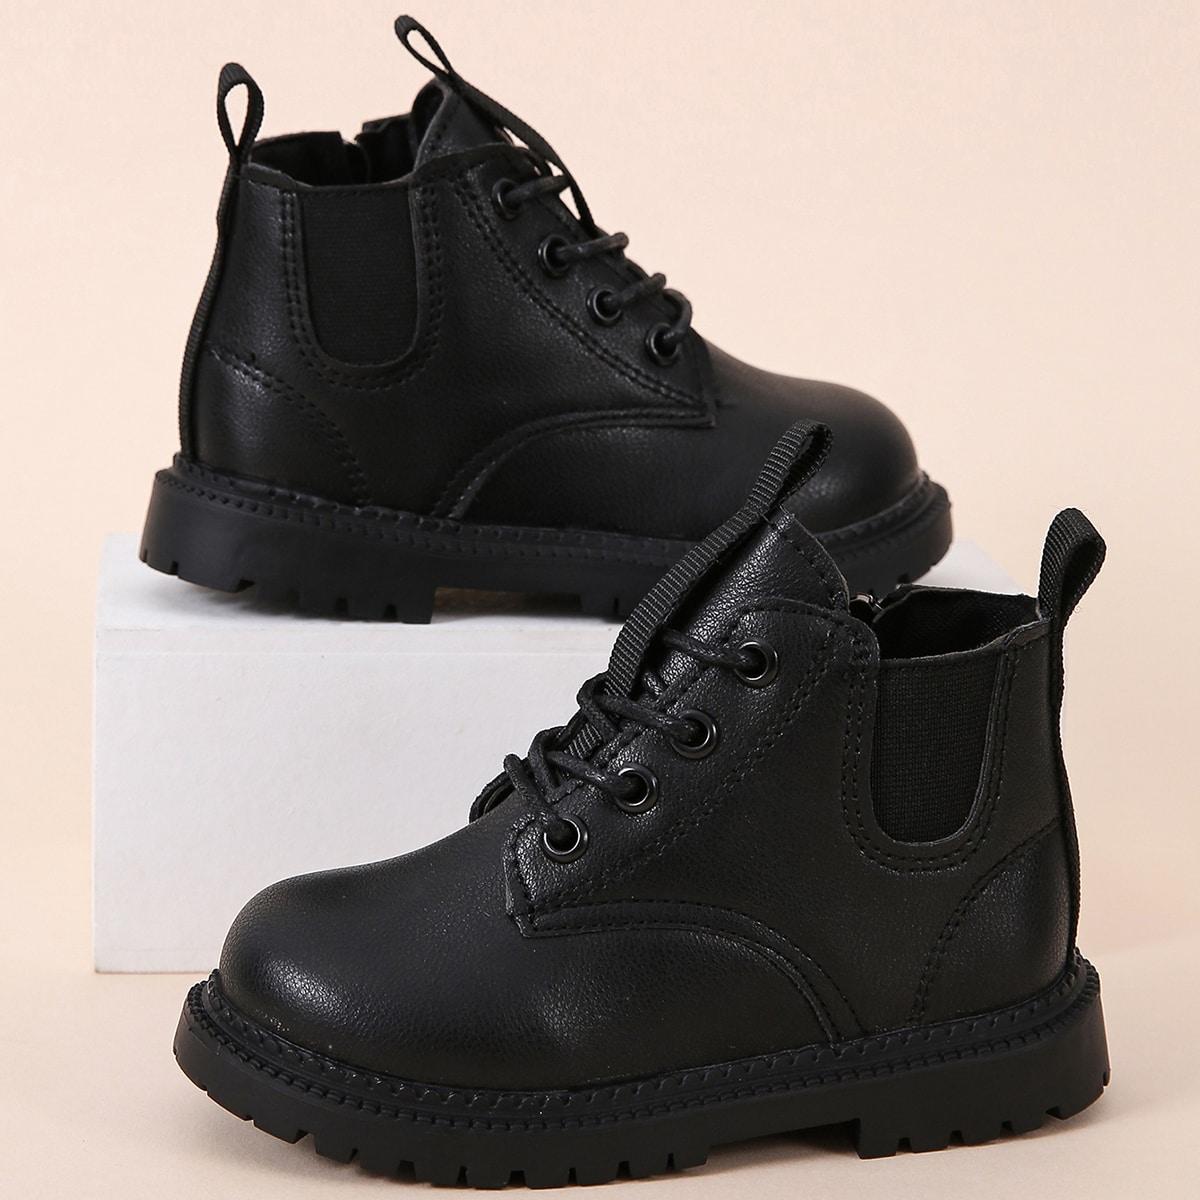 Ботинки на шнурках для мальчиков SheIn sk2107145840555448